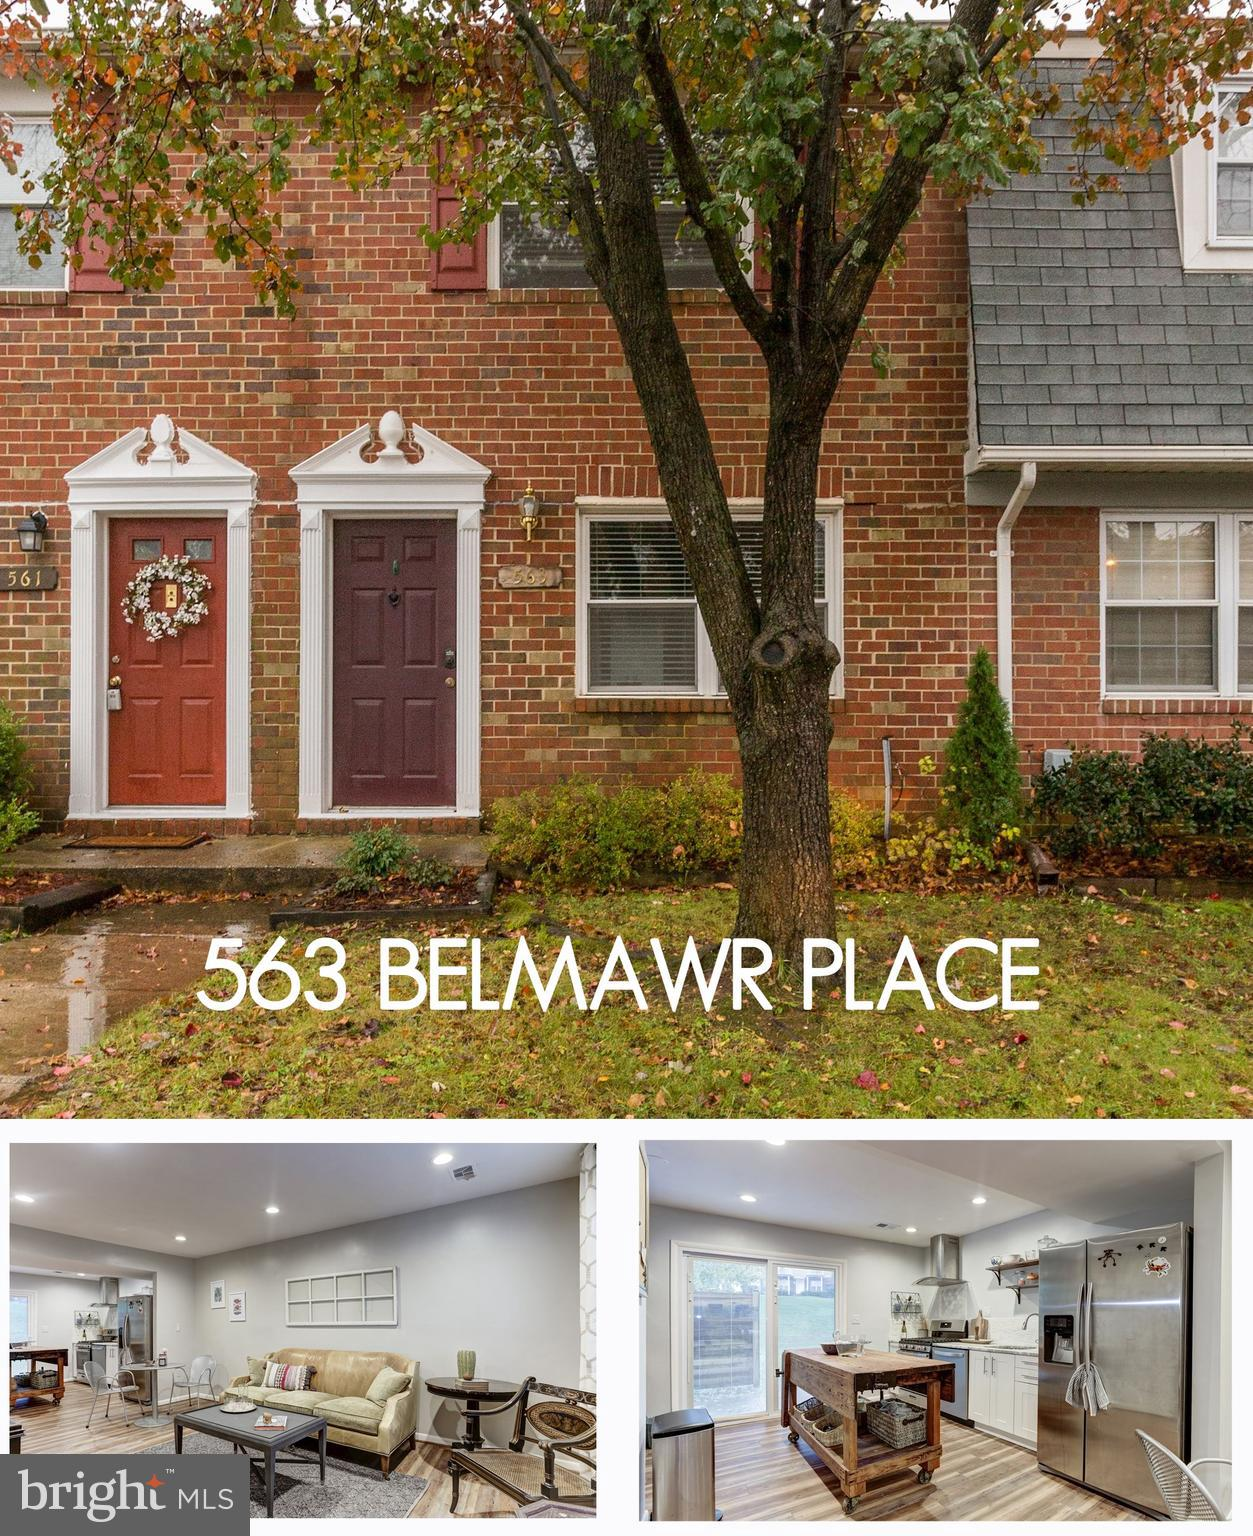 563 BELMAWR PLACE